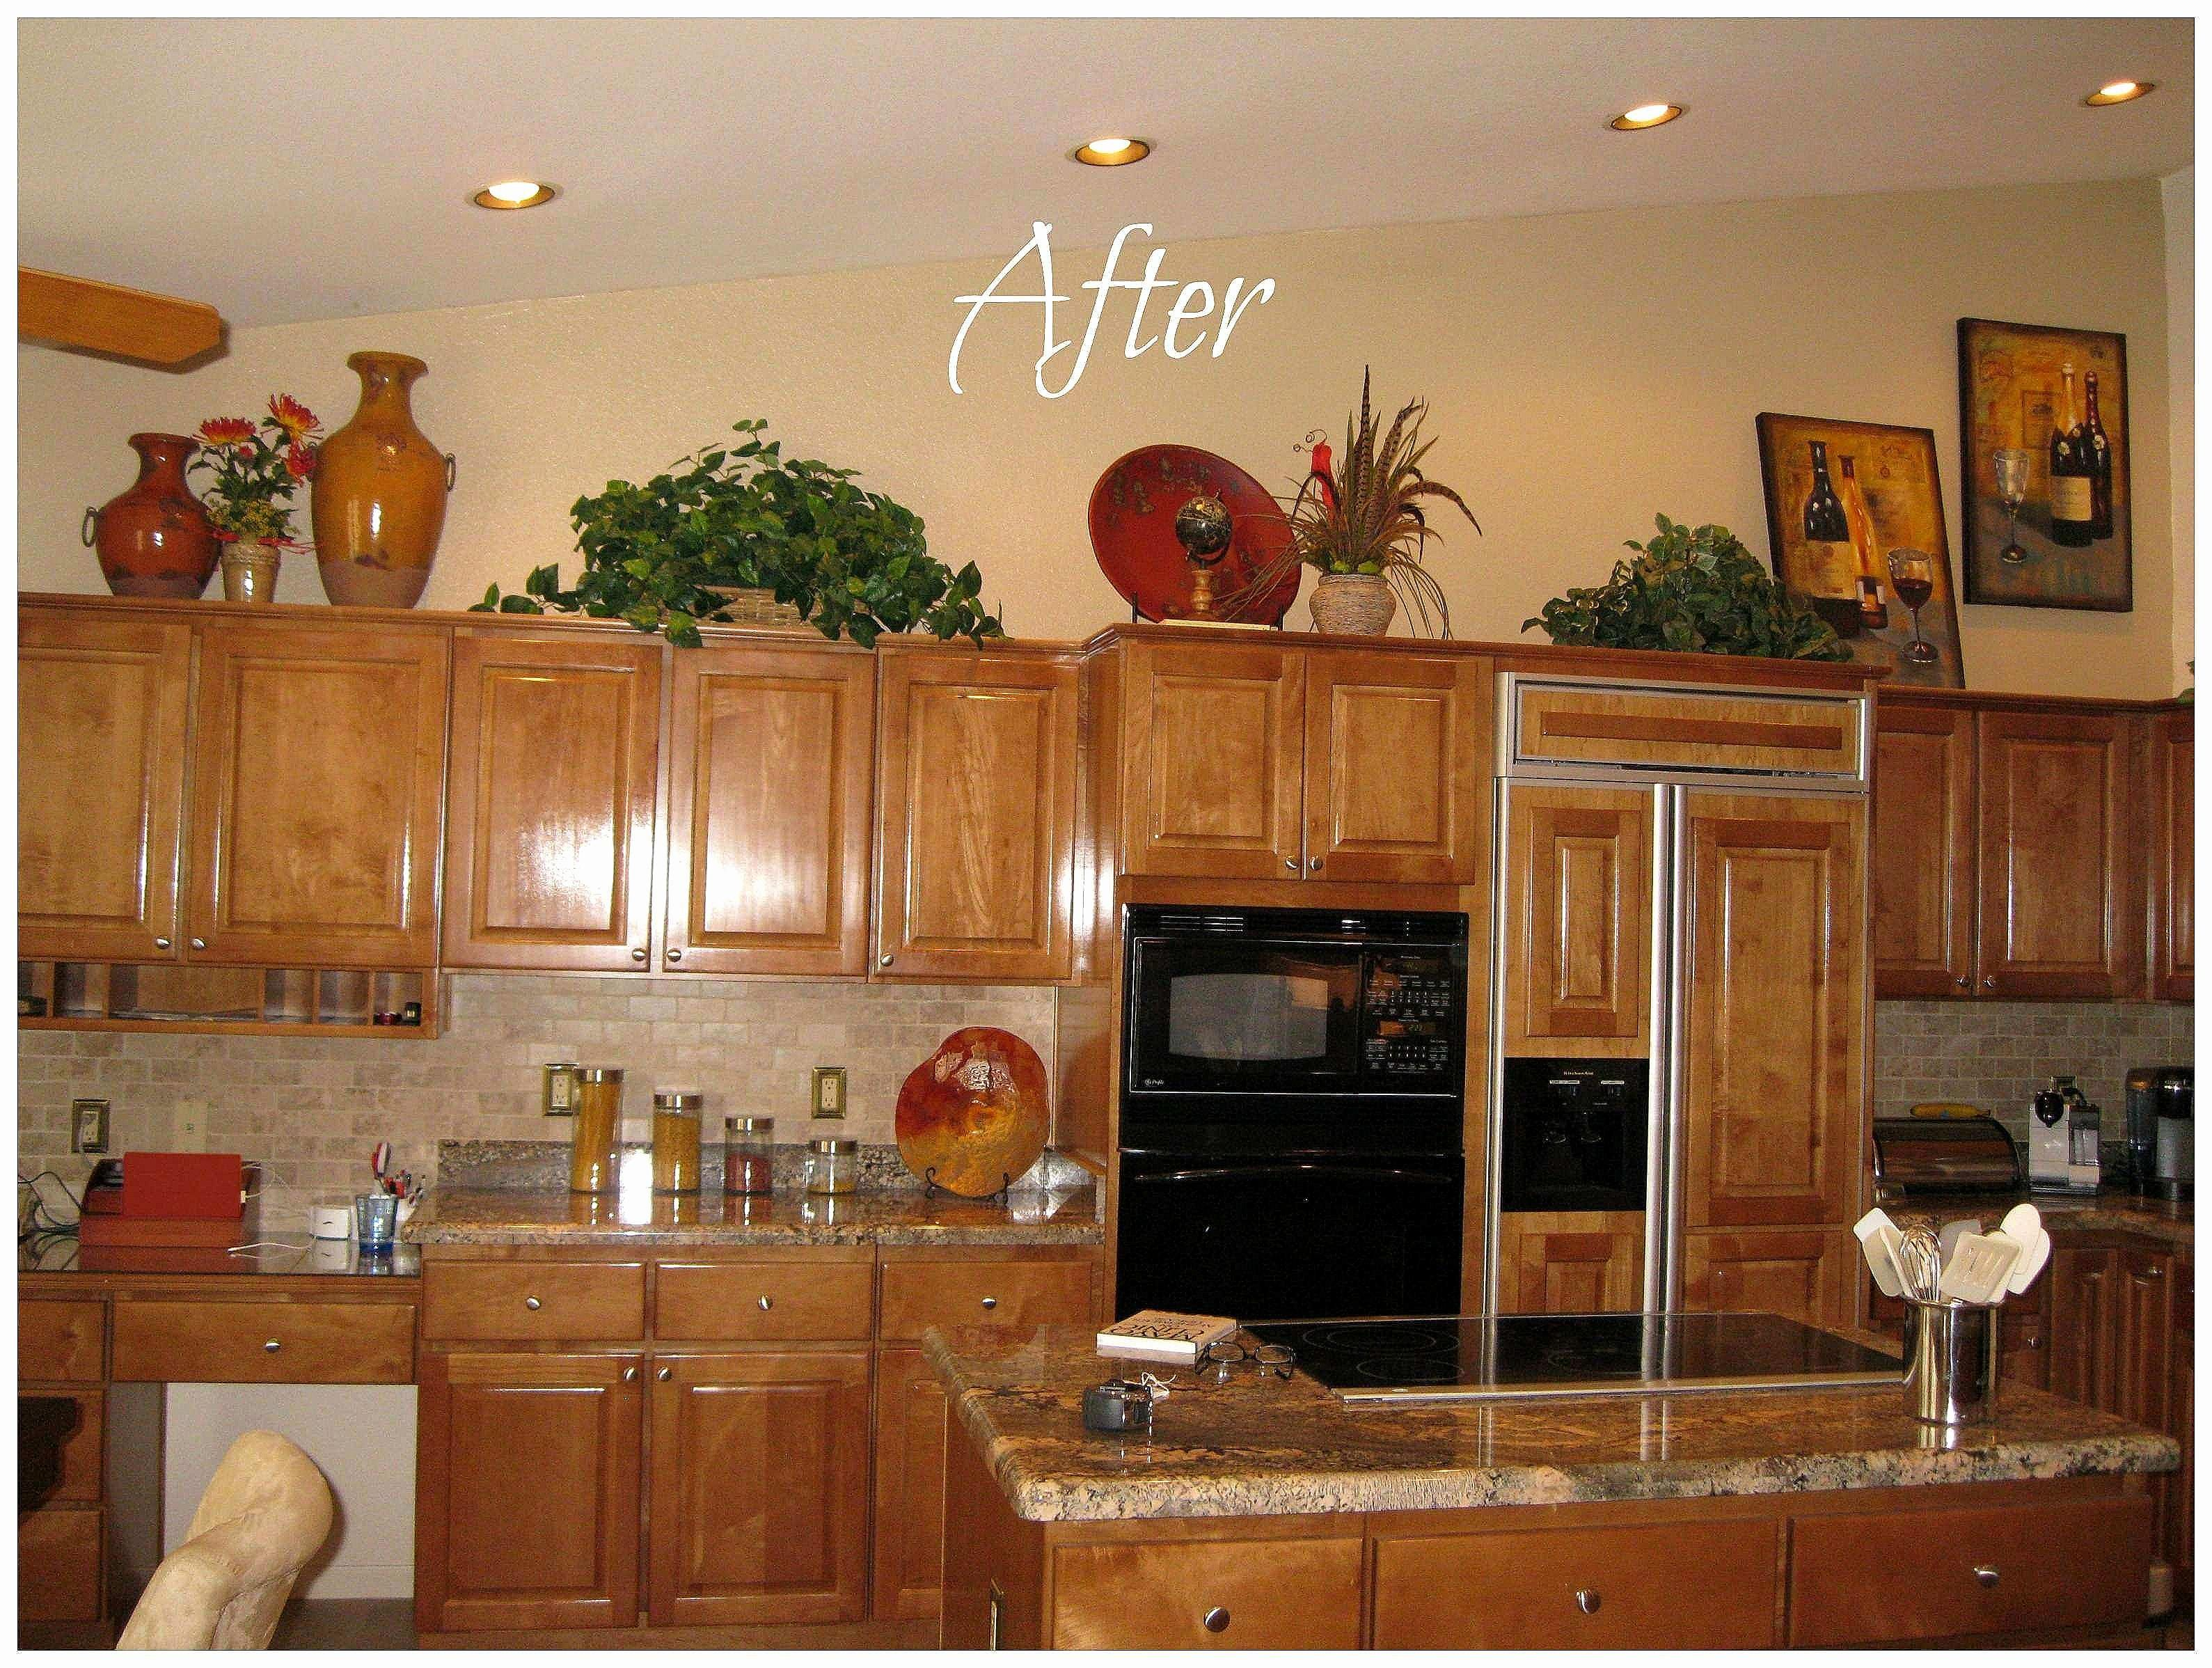 Elegant Apple Kitchen Decor Above Kitchen Cabinets Apple